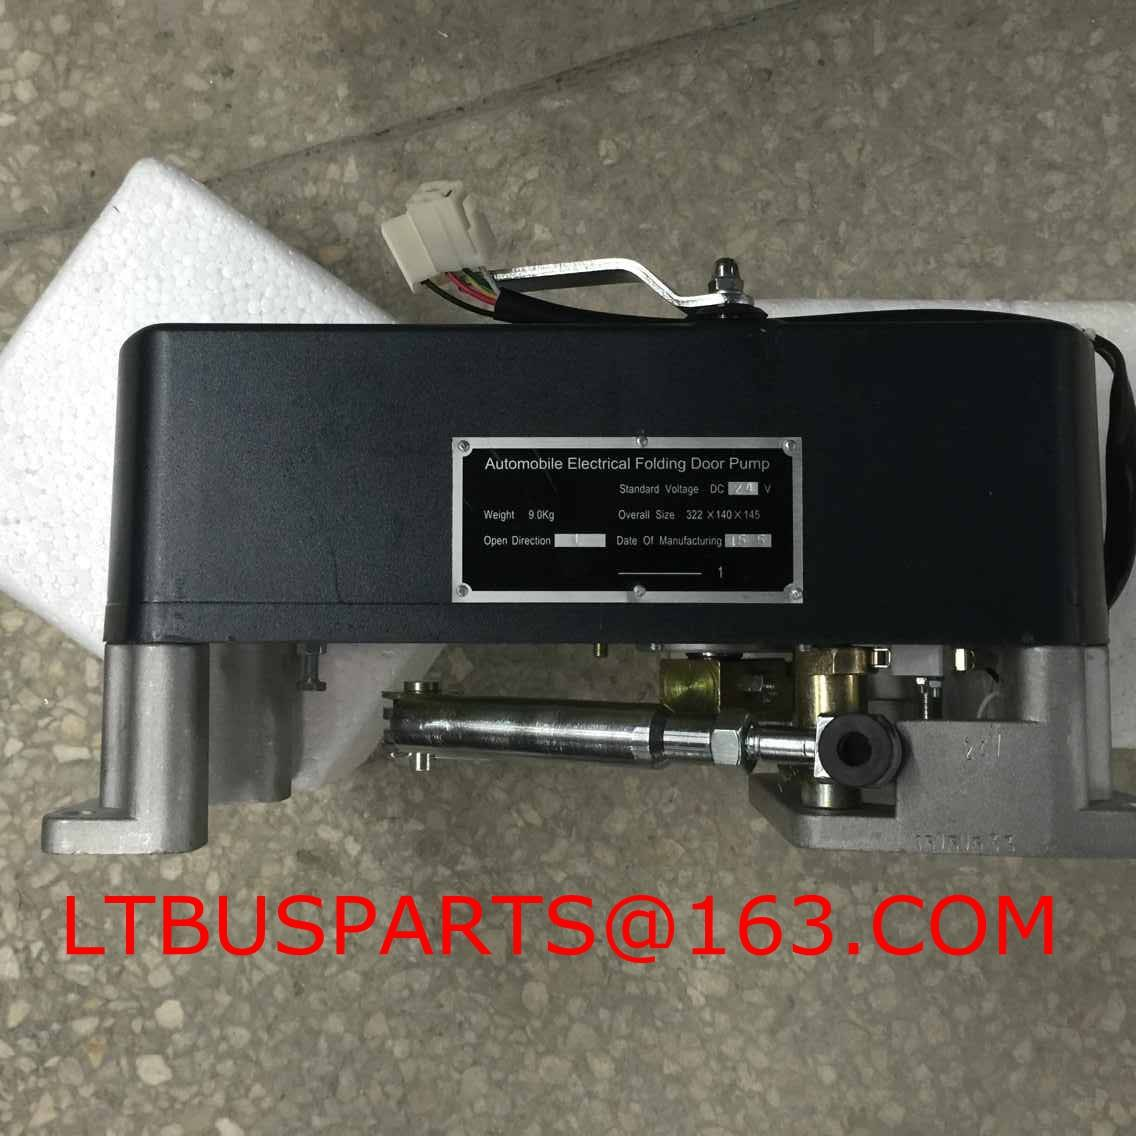 Electrical Bi-Fold Bus Door Mechanism for Bi fold City Bus (DX-B)